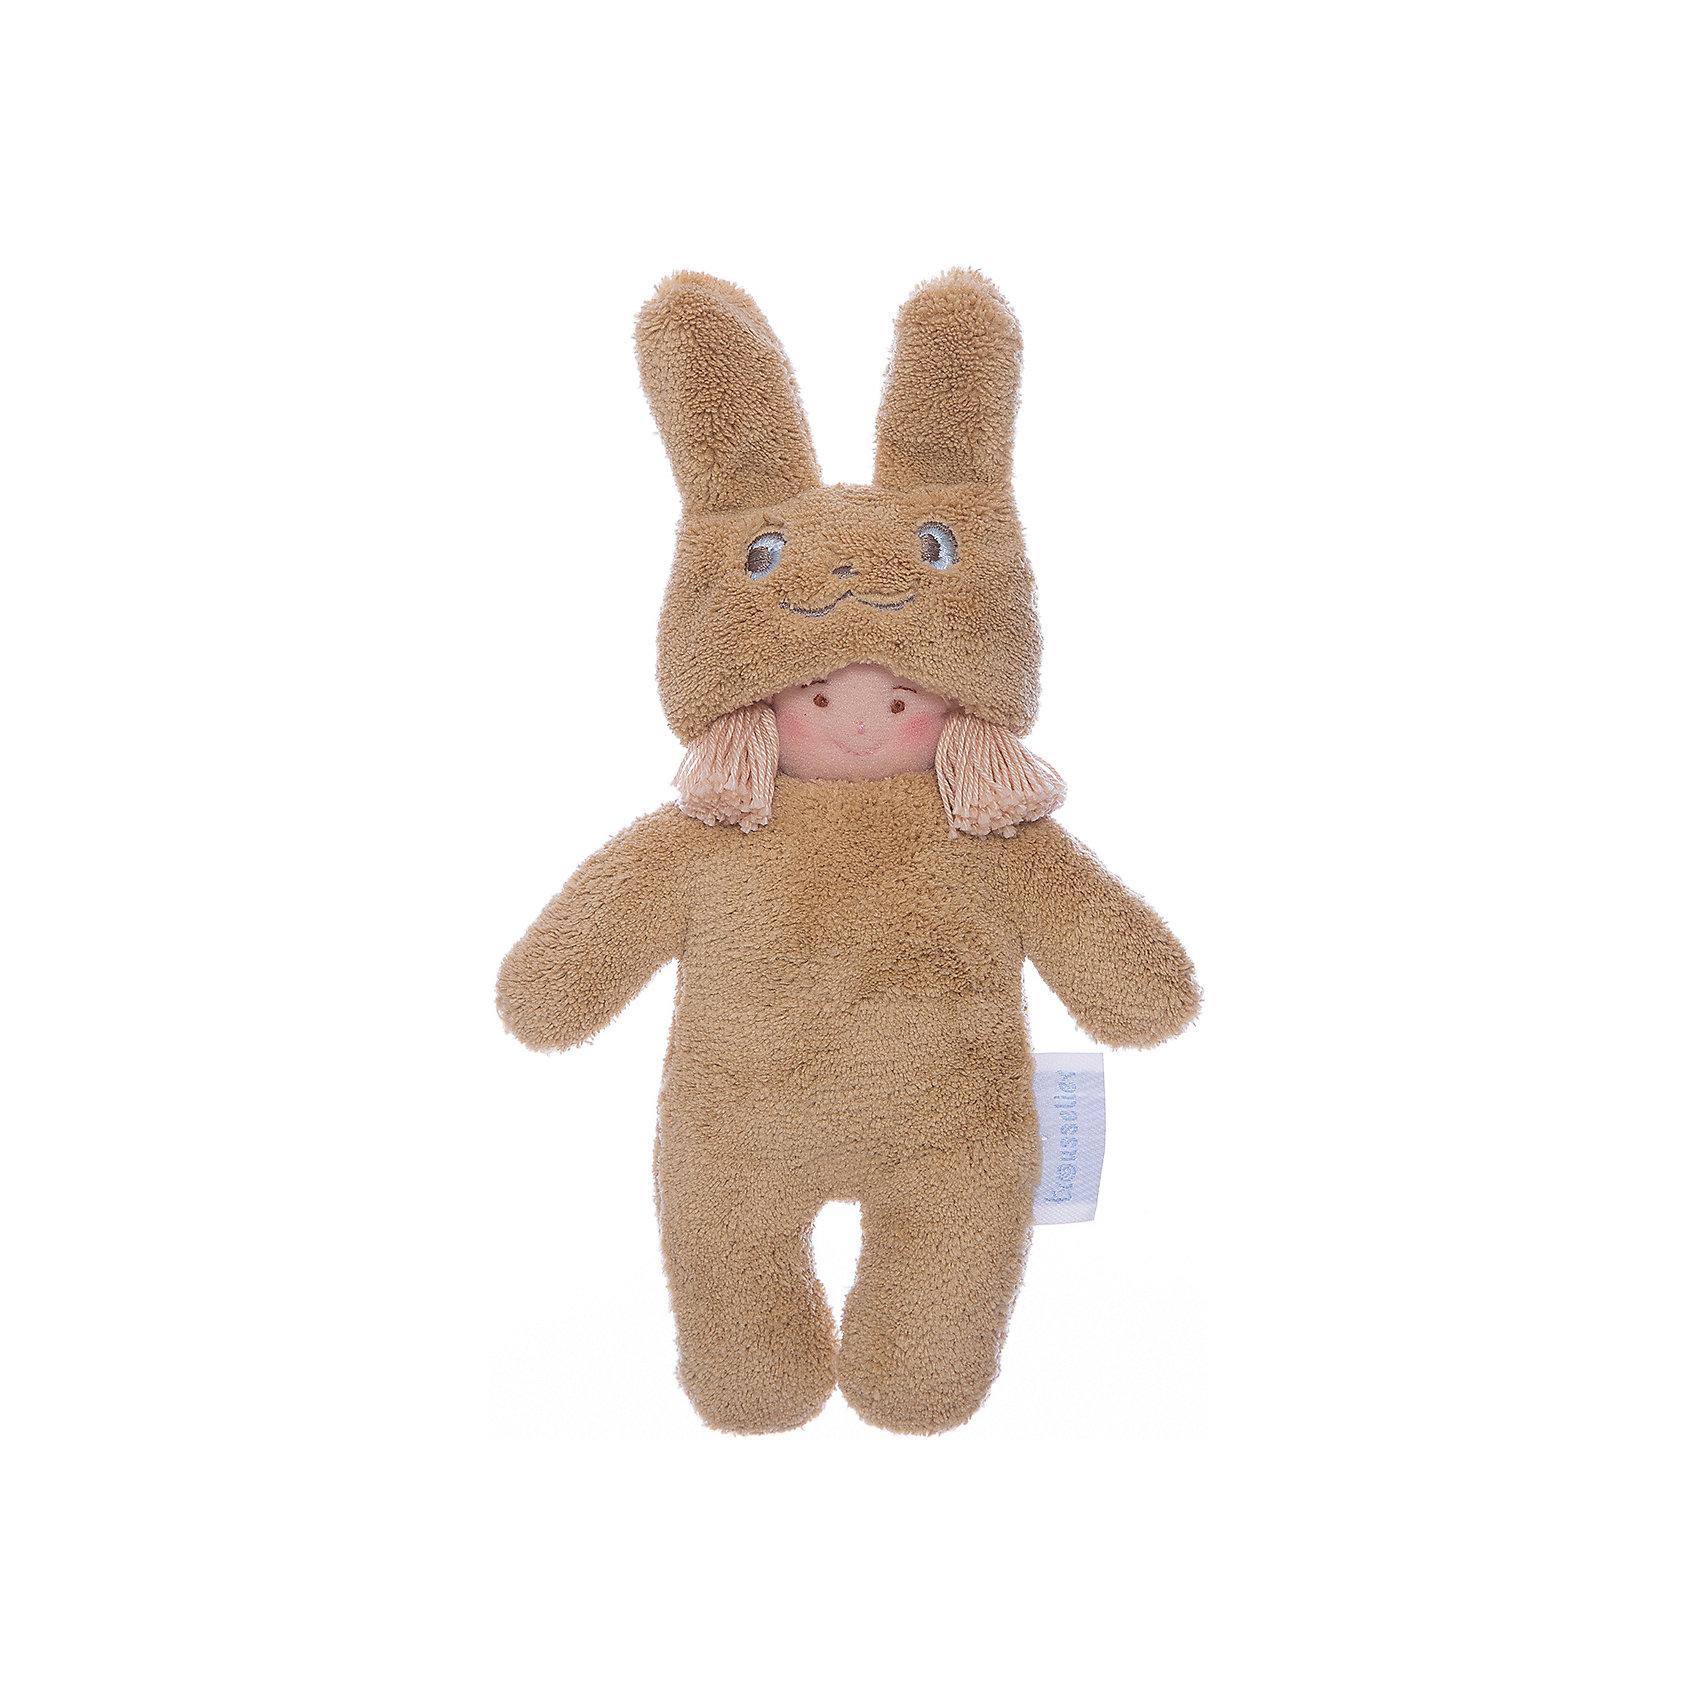 Тряпичная кукла Девочка в костюме кролика, 22см&#13;, Trousselier<br><br>Ширина мм: 120<br>Глубина мм: 40<br>Высота мм: 40<br>Вес г: 180<br>Возраст от месяцев: -2147483648<br>Возраст до месяцев: 2147483647<br>Пол: Унисекс<br>Возраст: Детский<br>SKU: 4964788